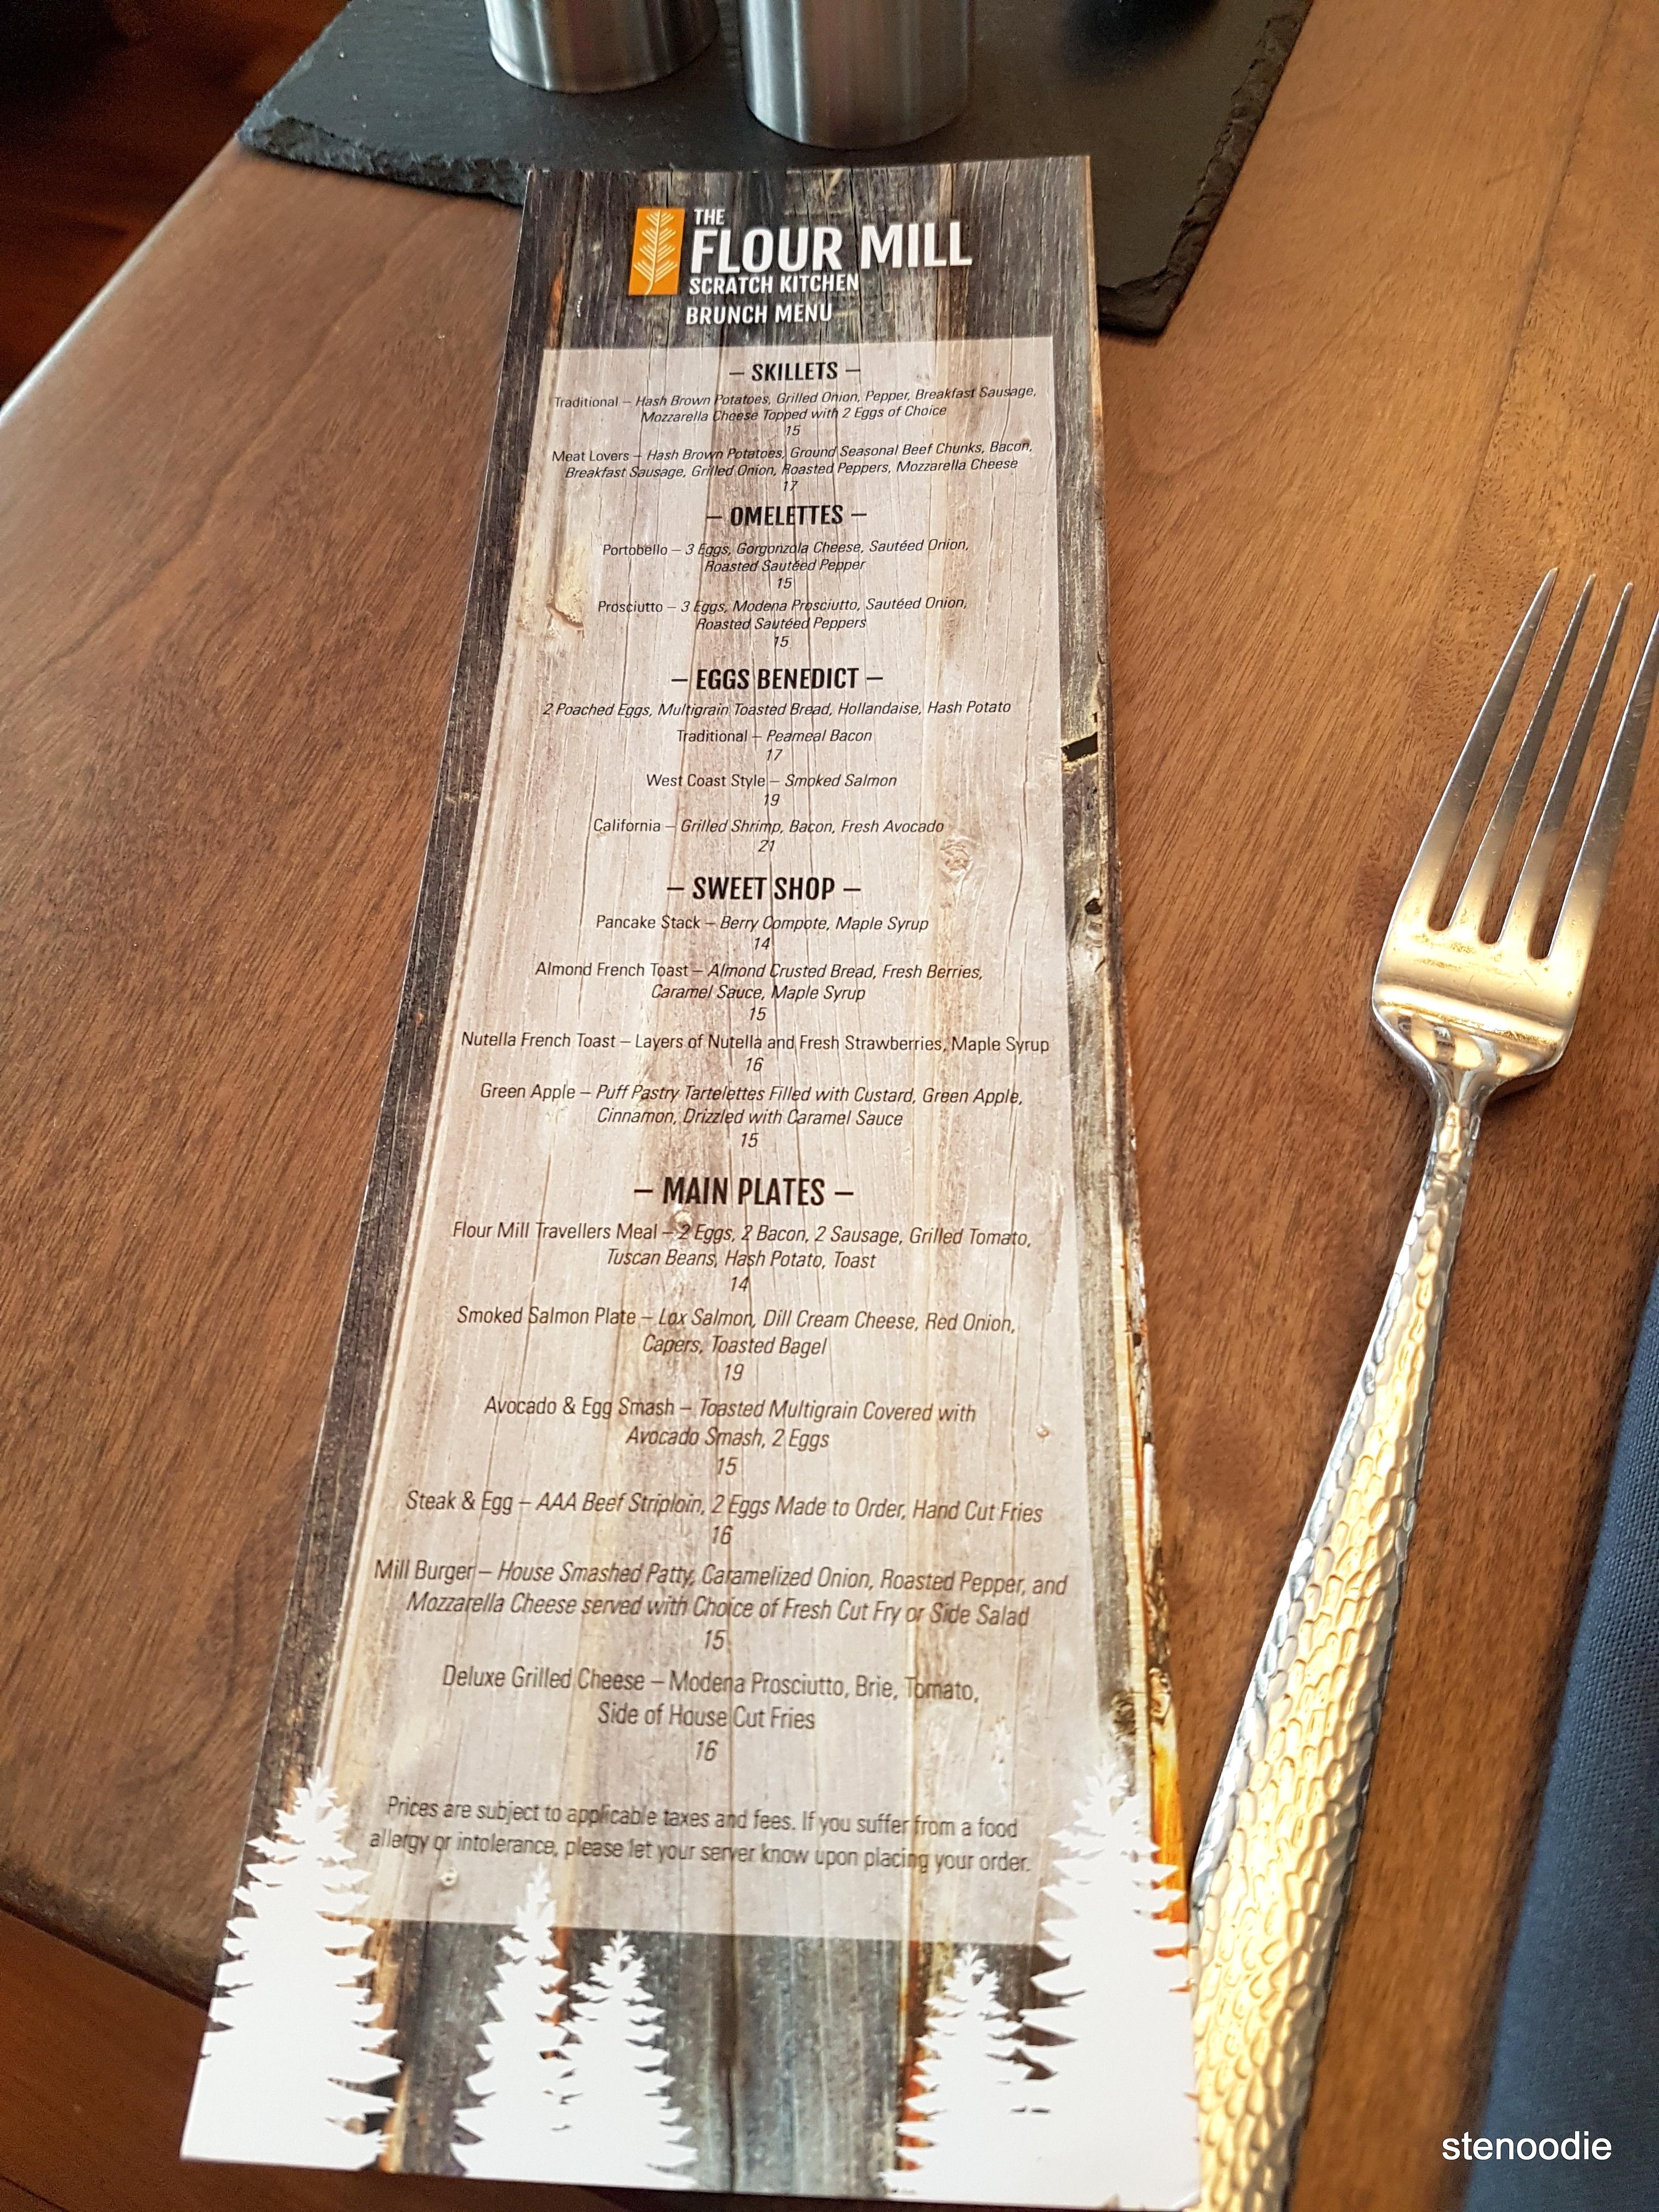 Brunch menu at The Flour Mill Restaurant